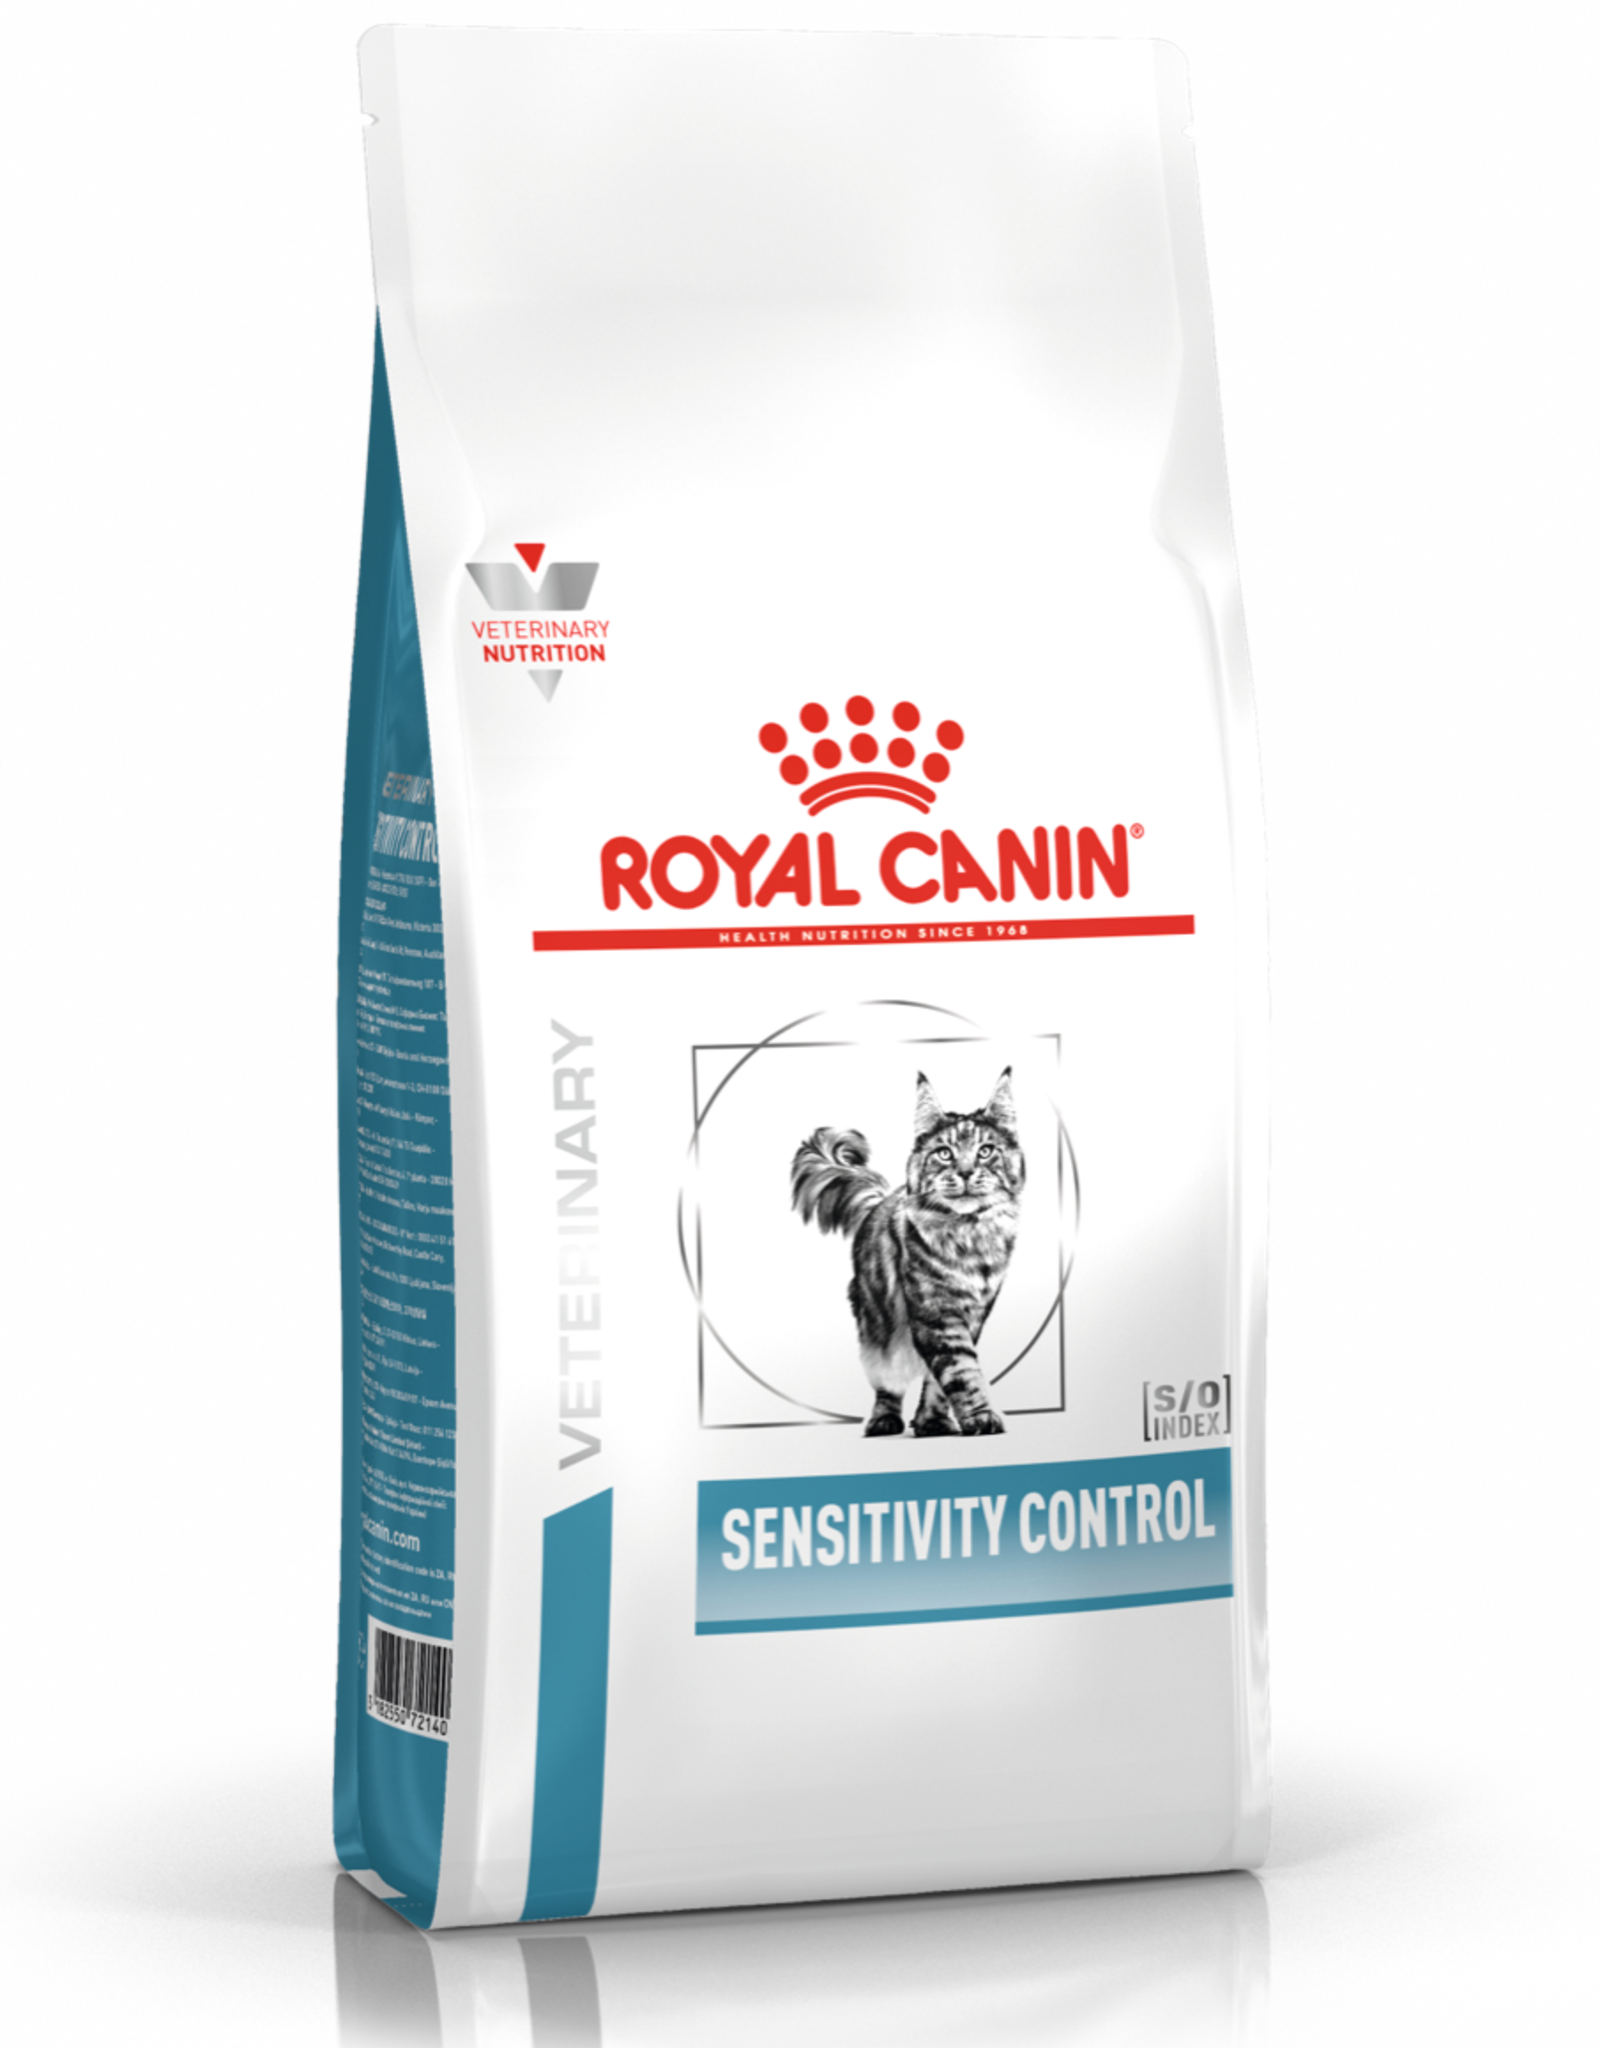 Royal Canin Royal Canin Sensitivity Control Kat Eend 1,5kg